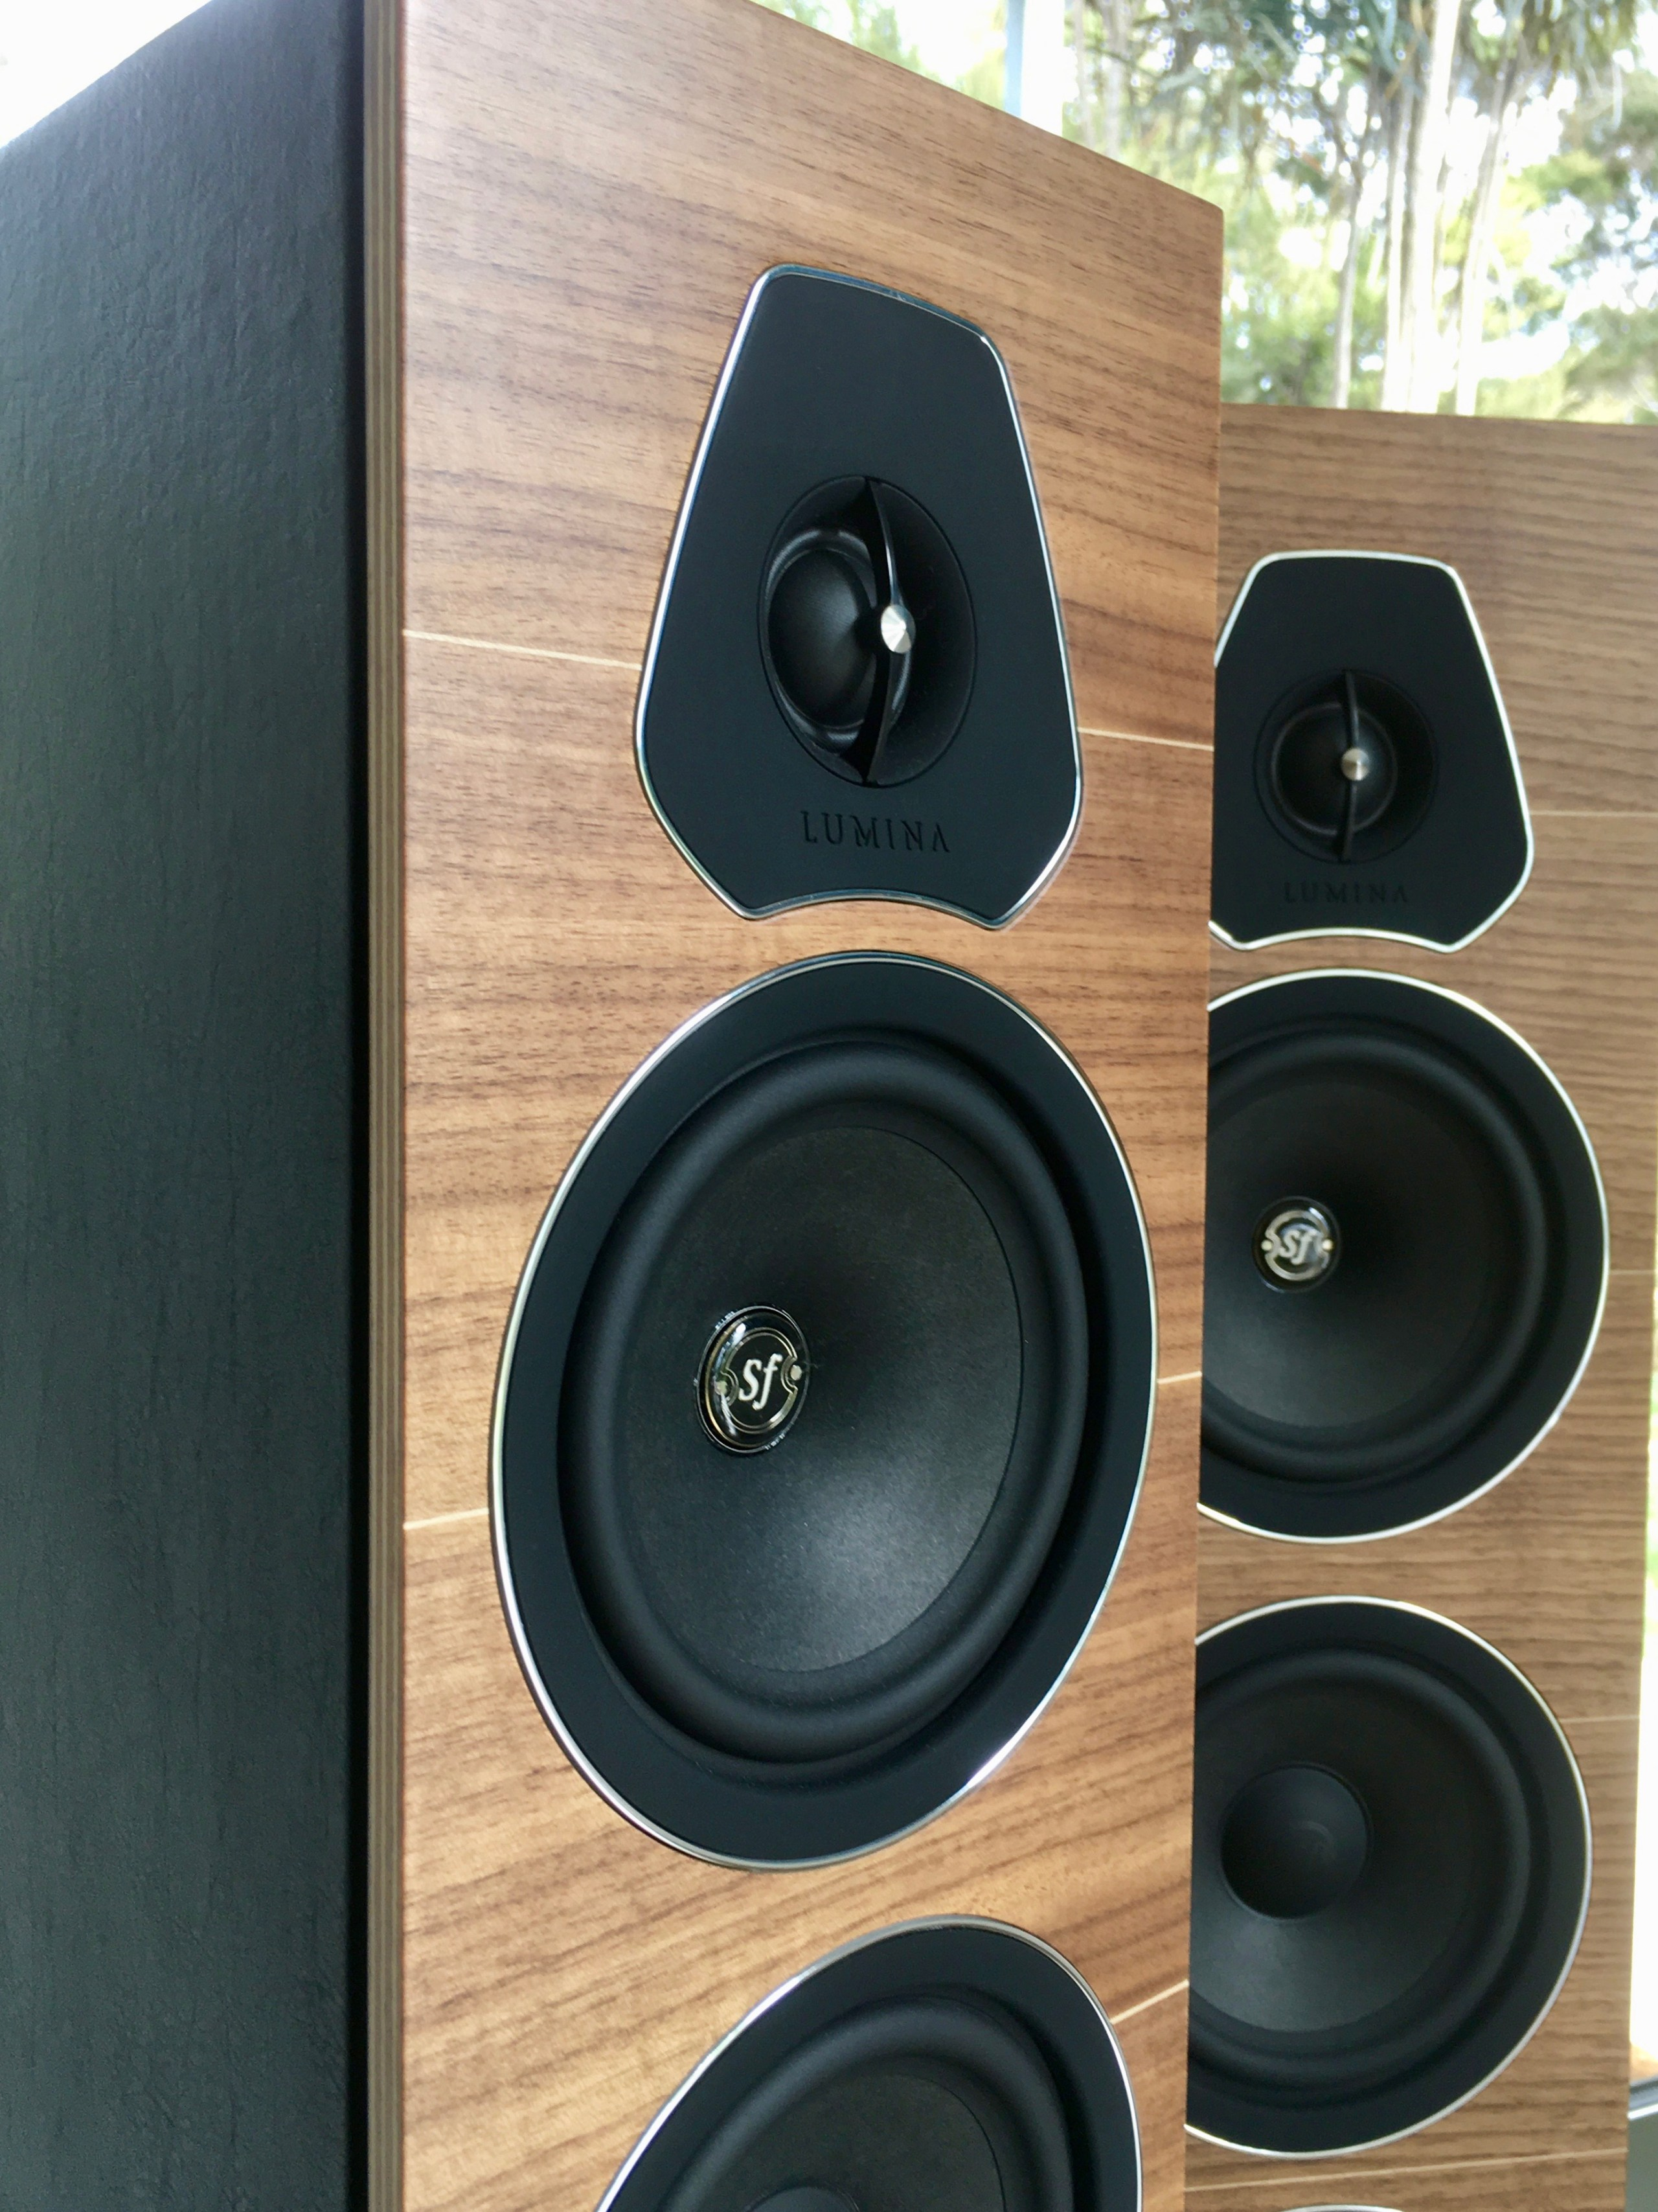 Sonus faber Lumina III loudspeakers @totallywired.nz